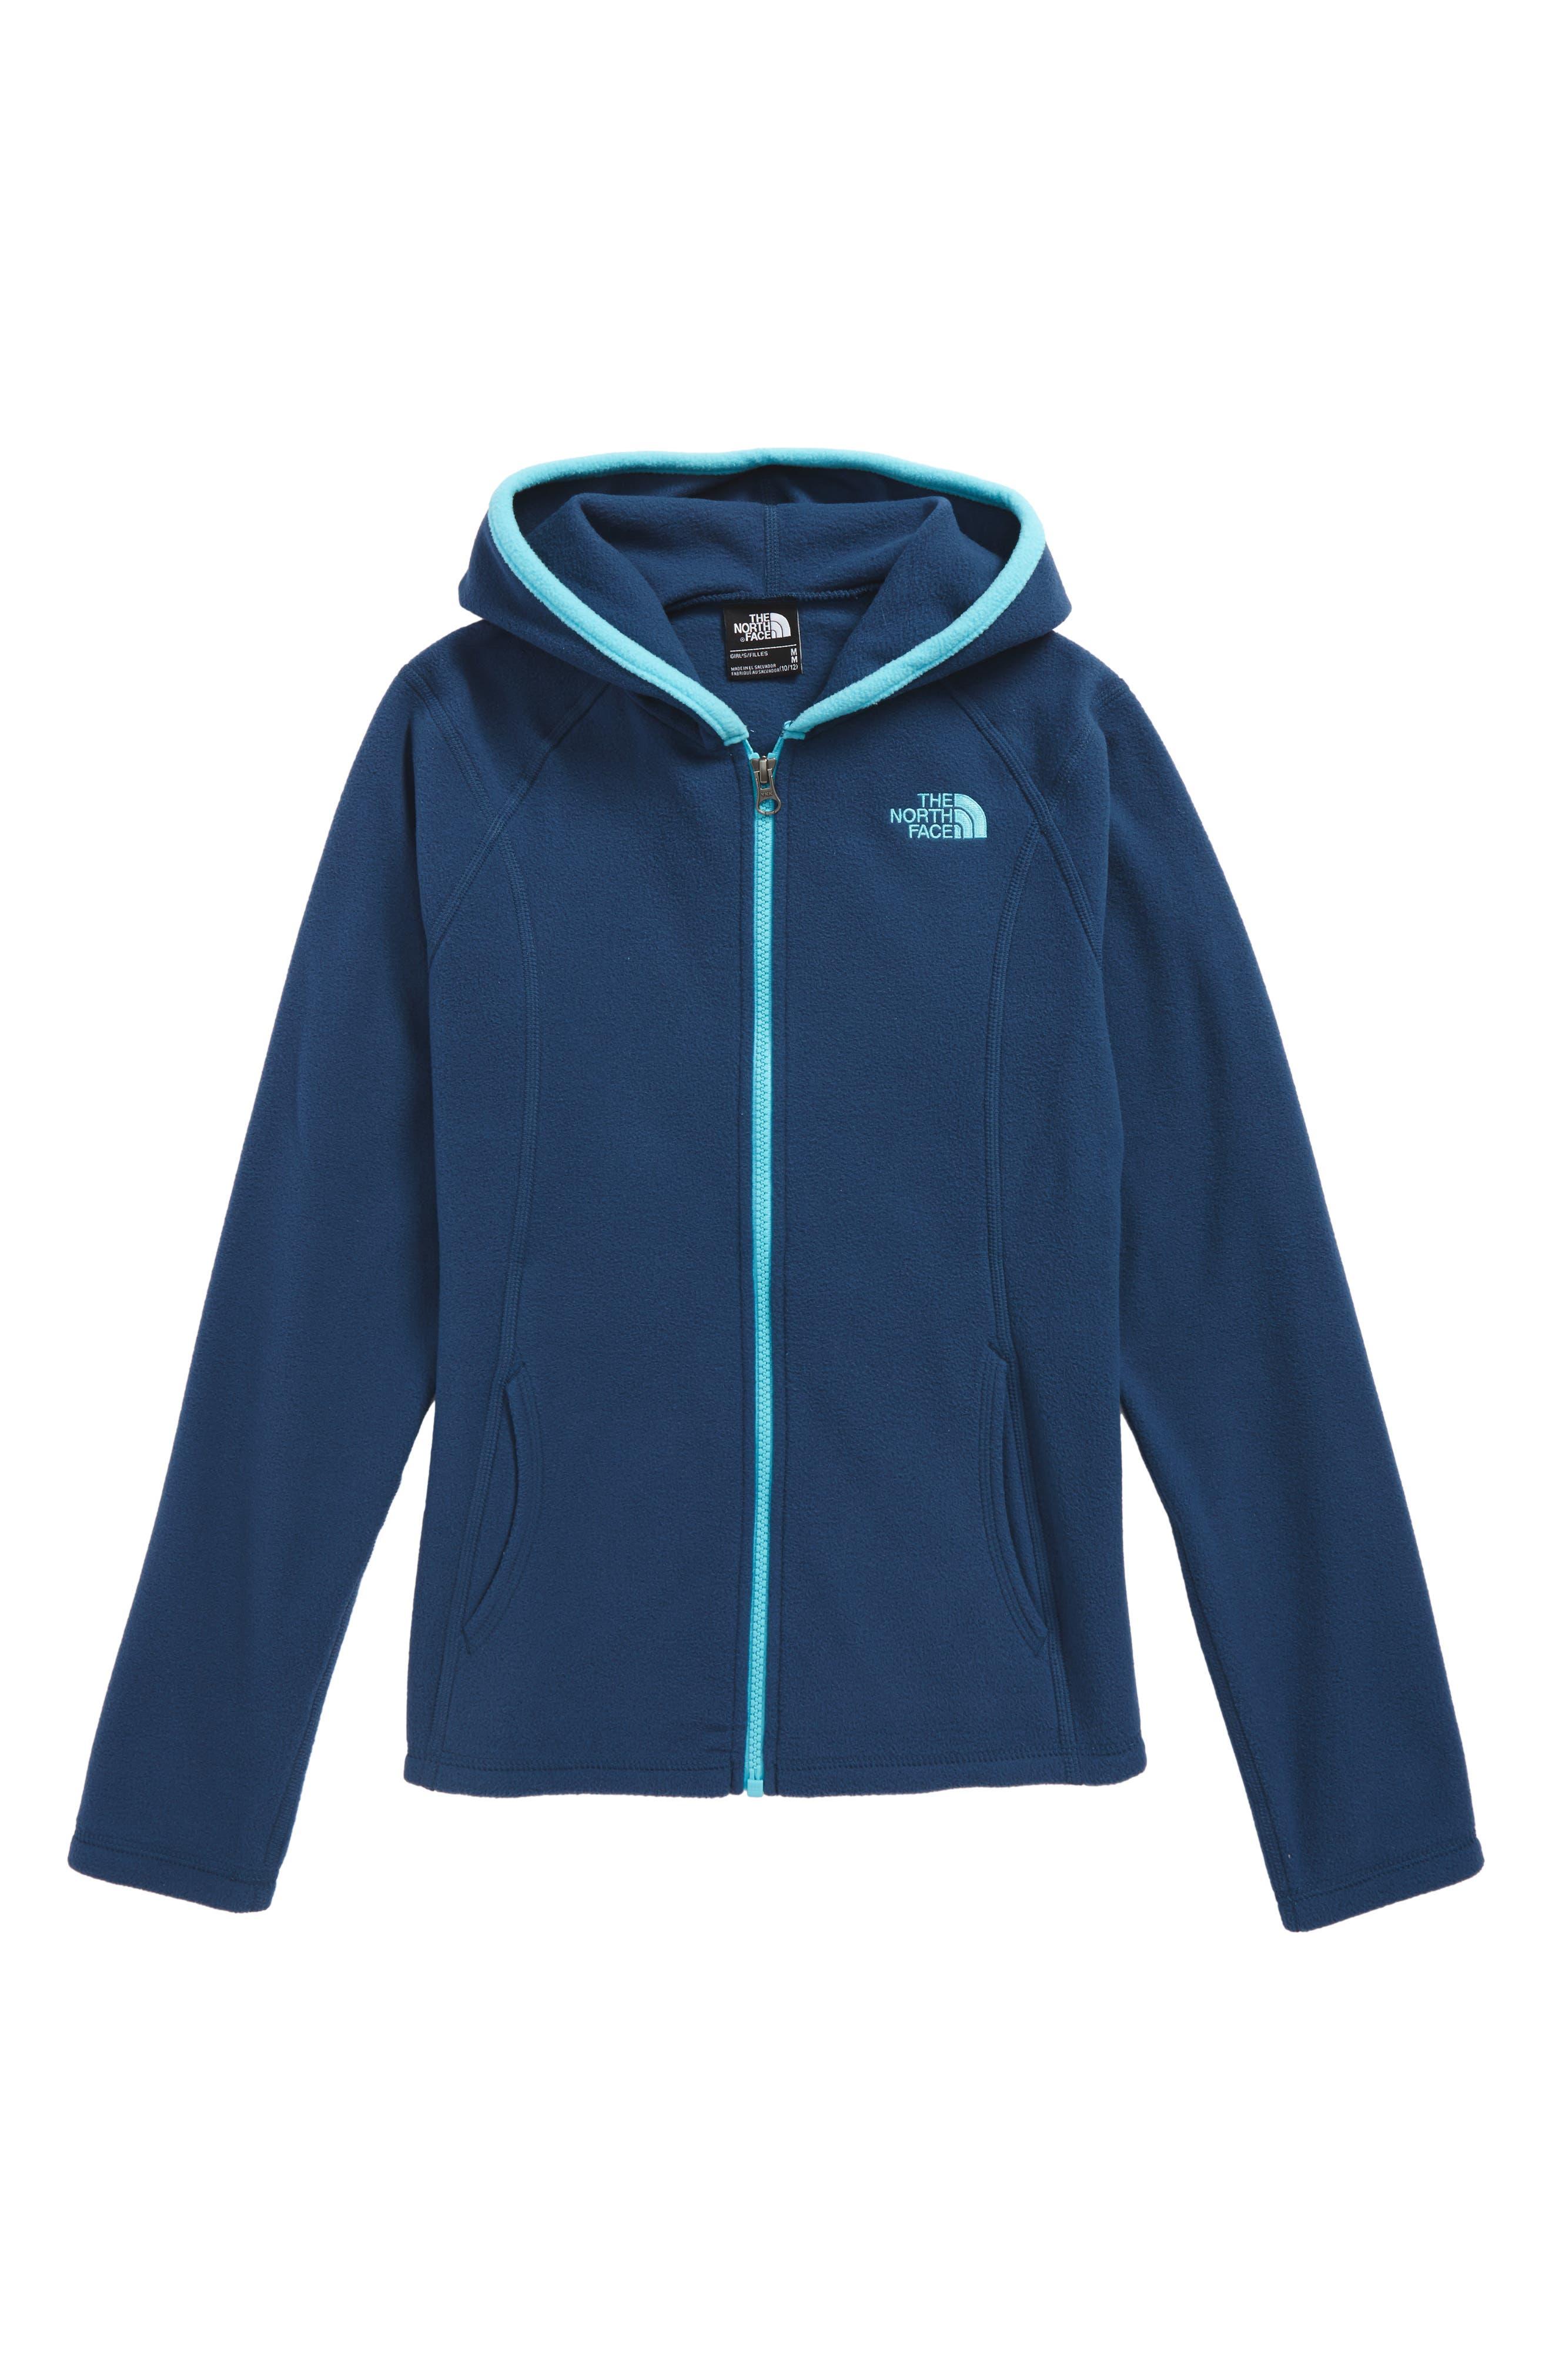 Glacier Full Zip Fleece Hoodie,                         Main,                         color, Blue Wing Teal